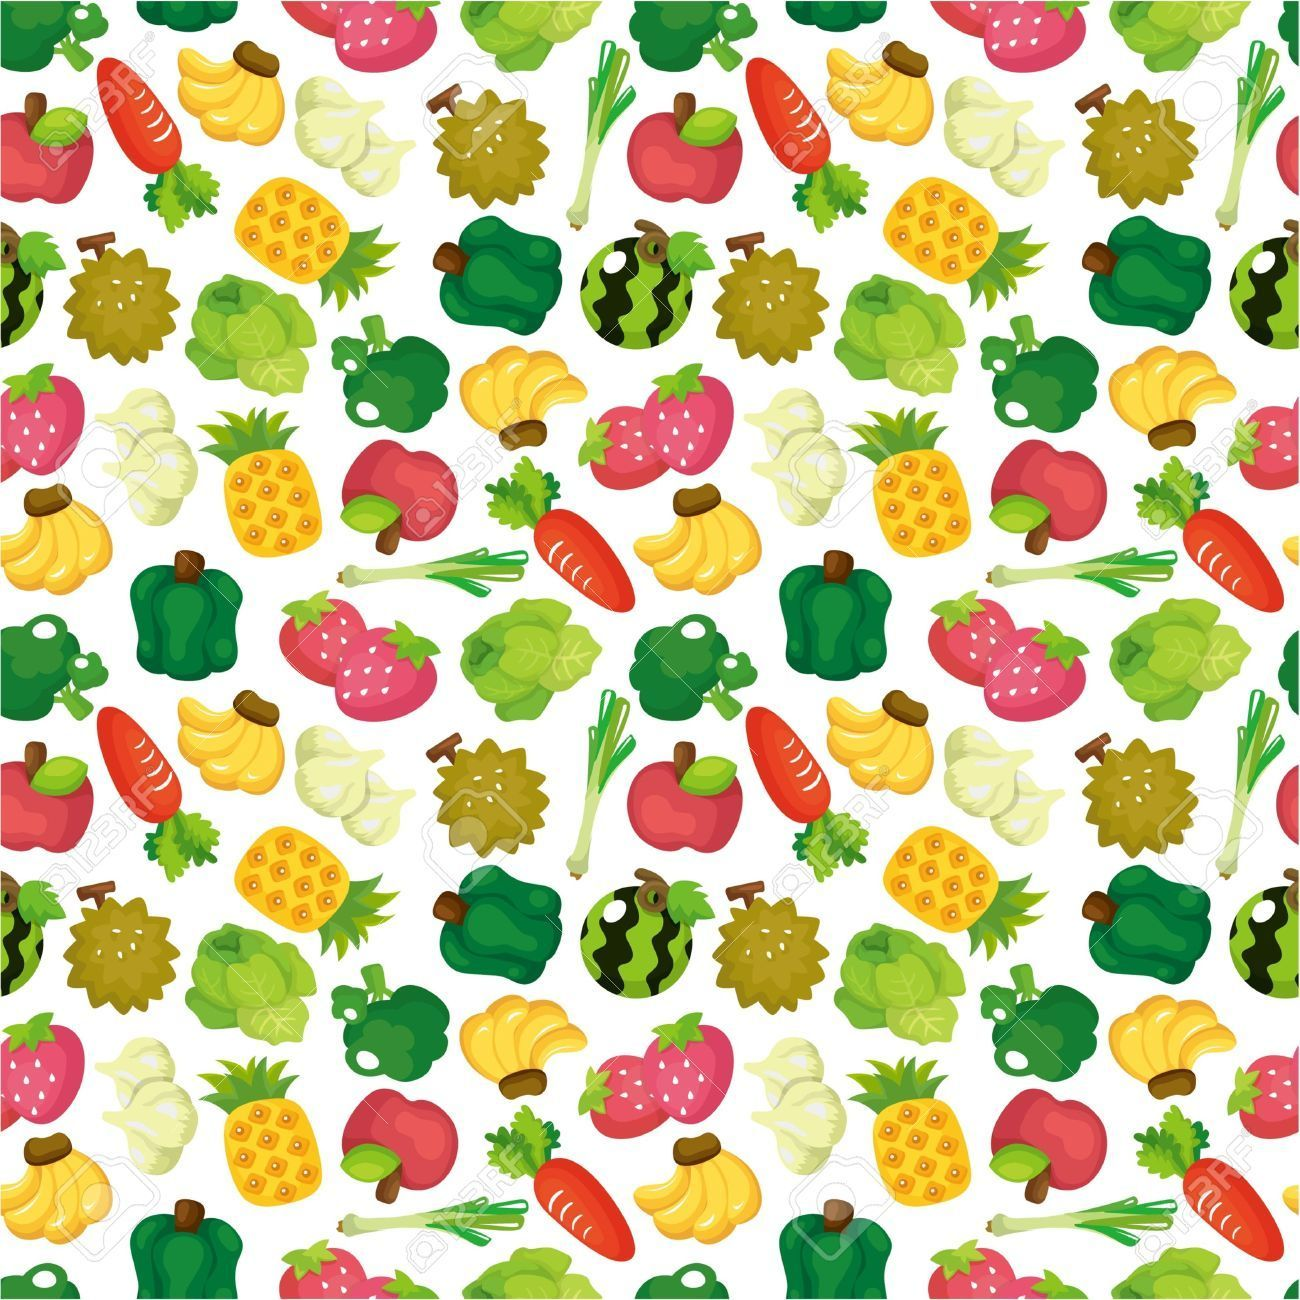 Cute Veggie Wallpapers Top Free Cute Veggie Backgrounds Wallpaperaccess Food Wallpaper Wallpaper Wallpaper Pictures